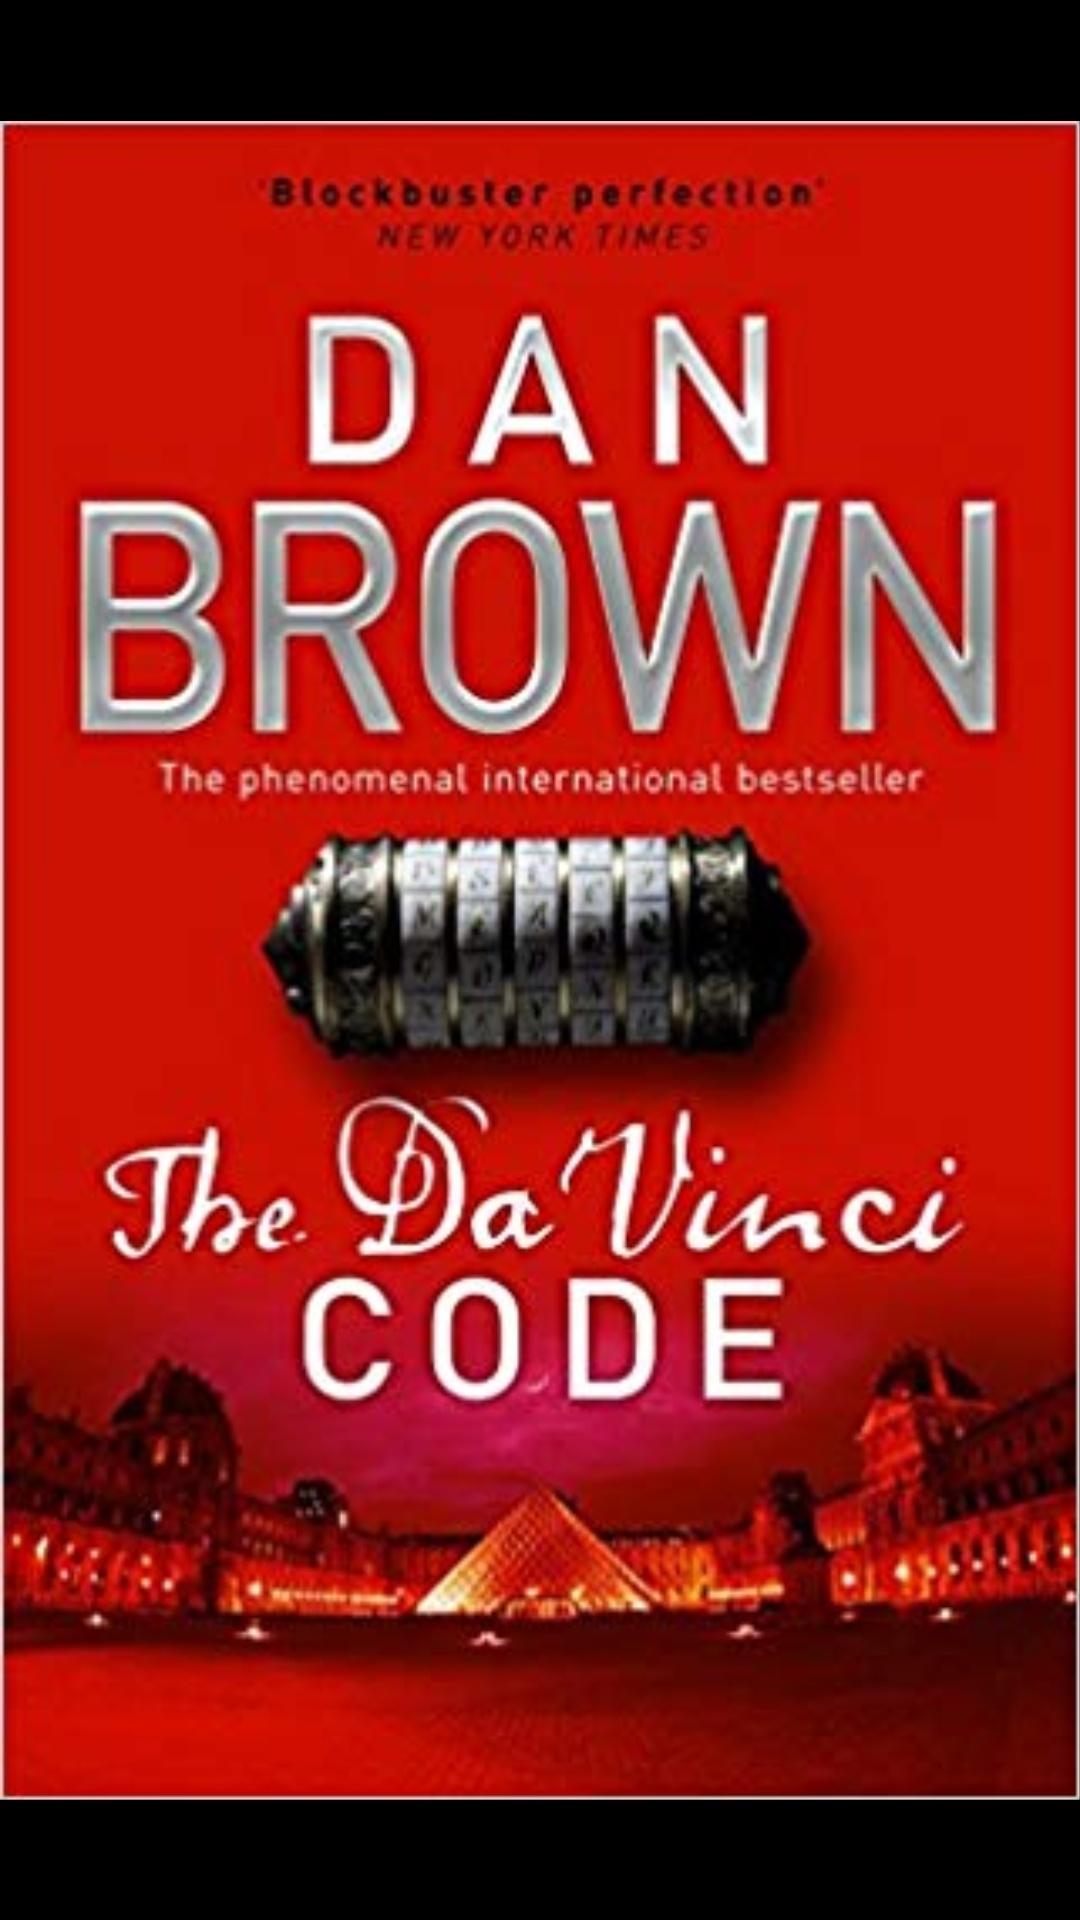 Which book of Dan Brown should I read first, The Da Vinci Code ...